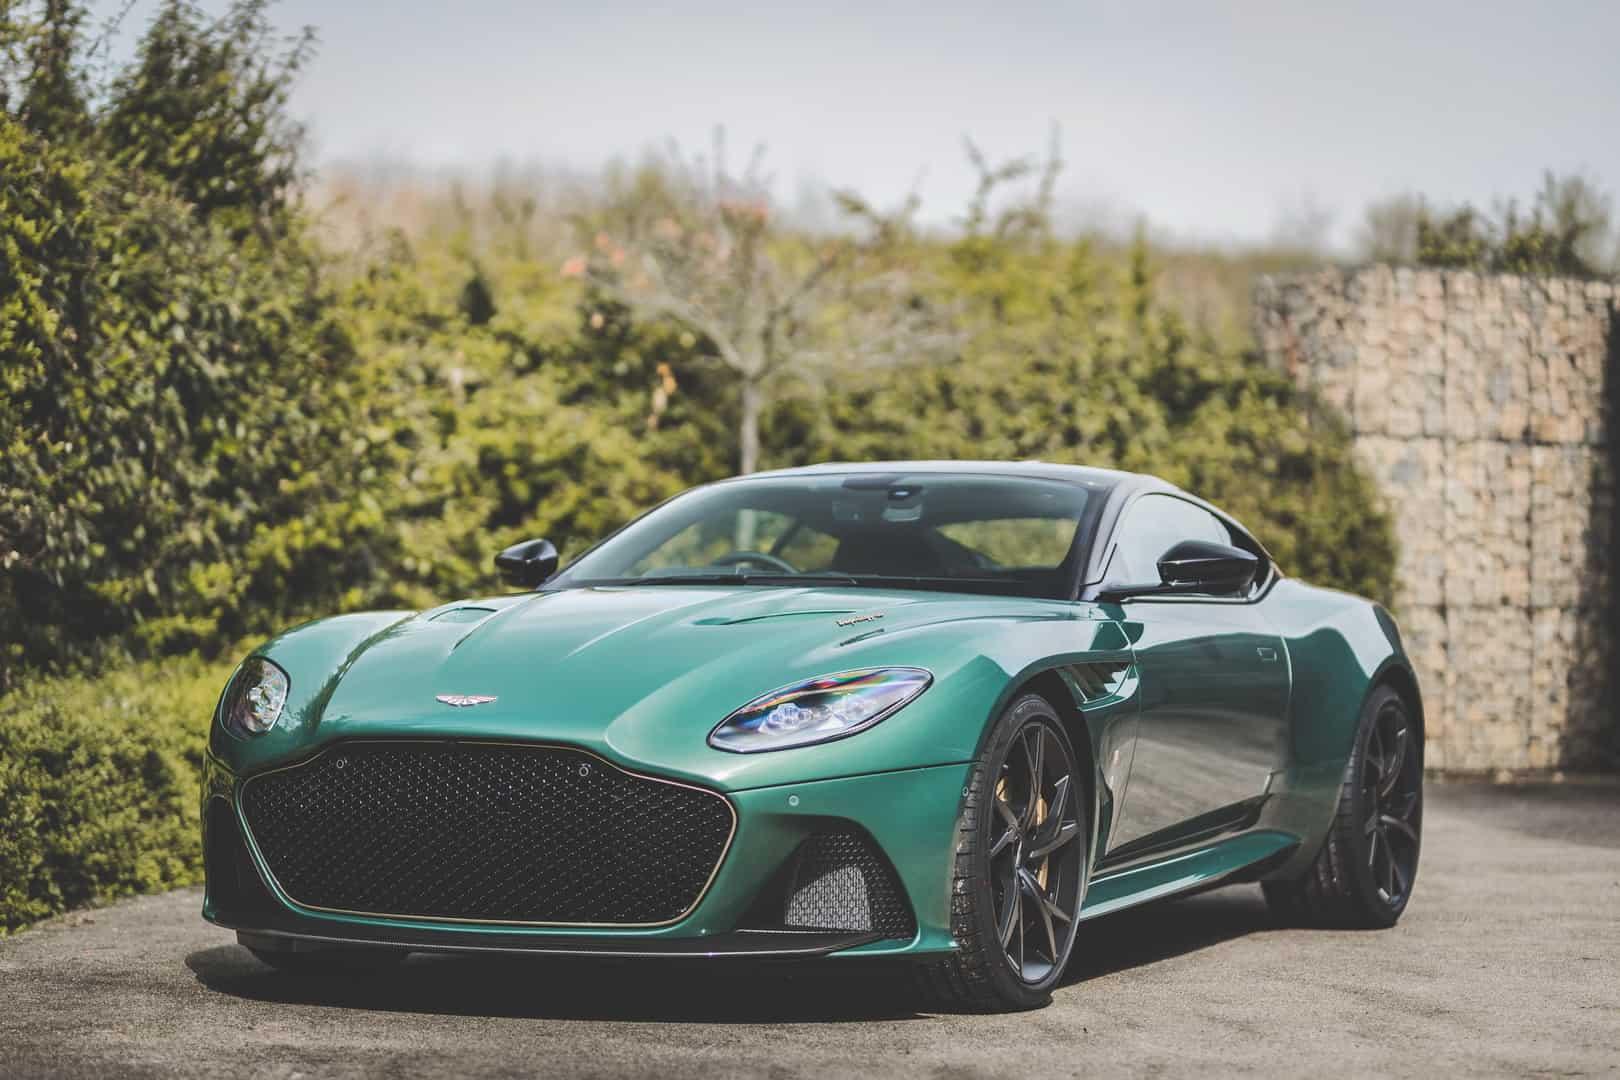 Aston Martin DBS 59 2